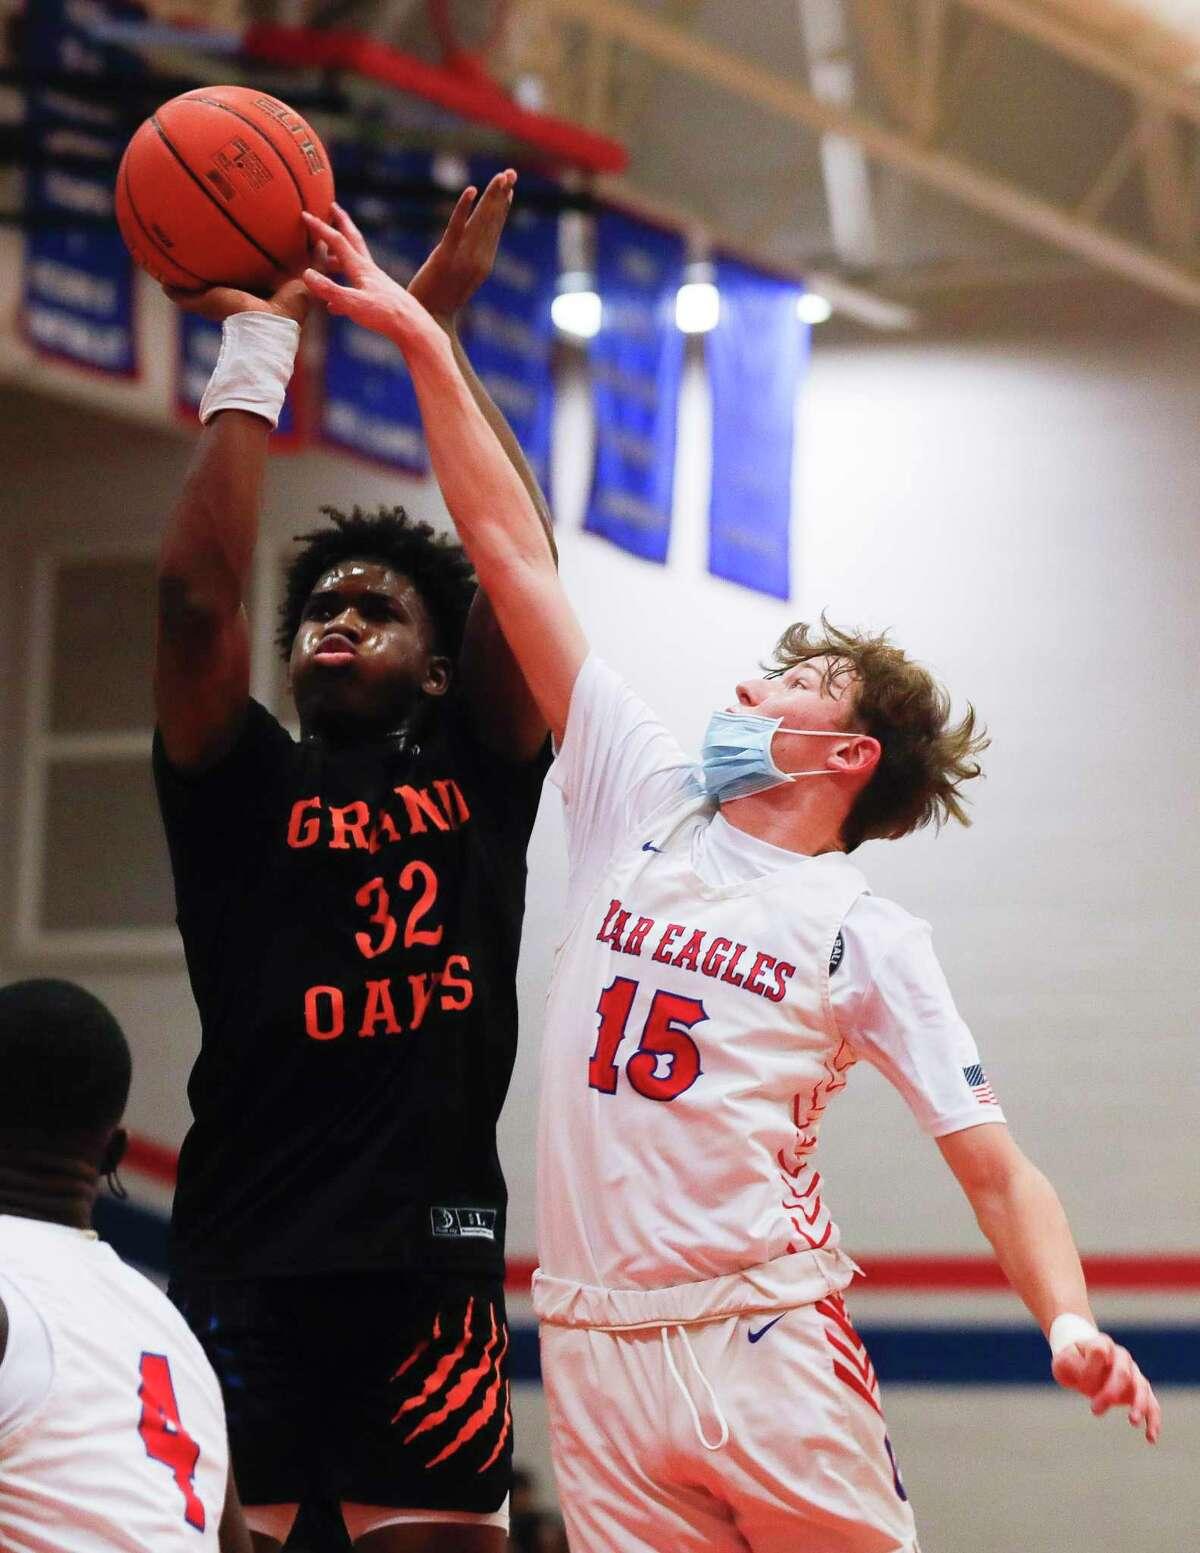 Oak Ridge's Justin Bryant (15) blocks a shot by Grand Oaks' Samuel Nkassa (32) during the first quarter of a District 13-6A high school basketball game at Oak Ridge High School, Tuesday, Feb. 9, 2021.